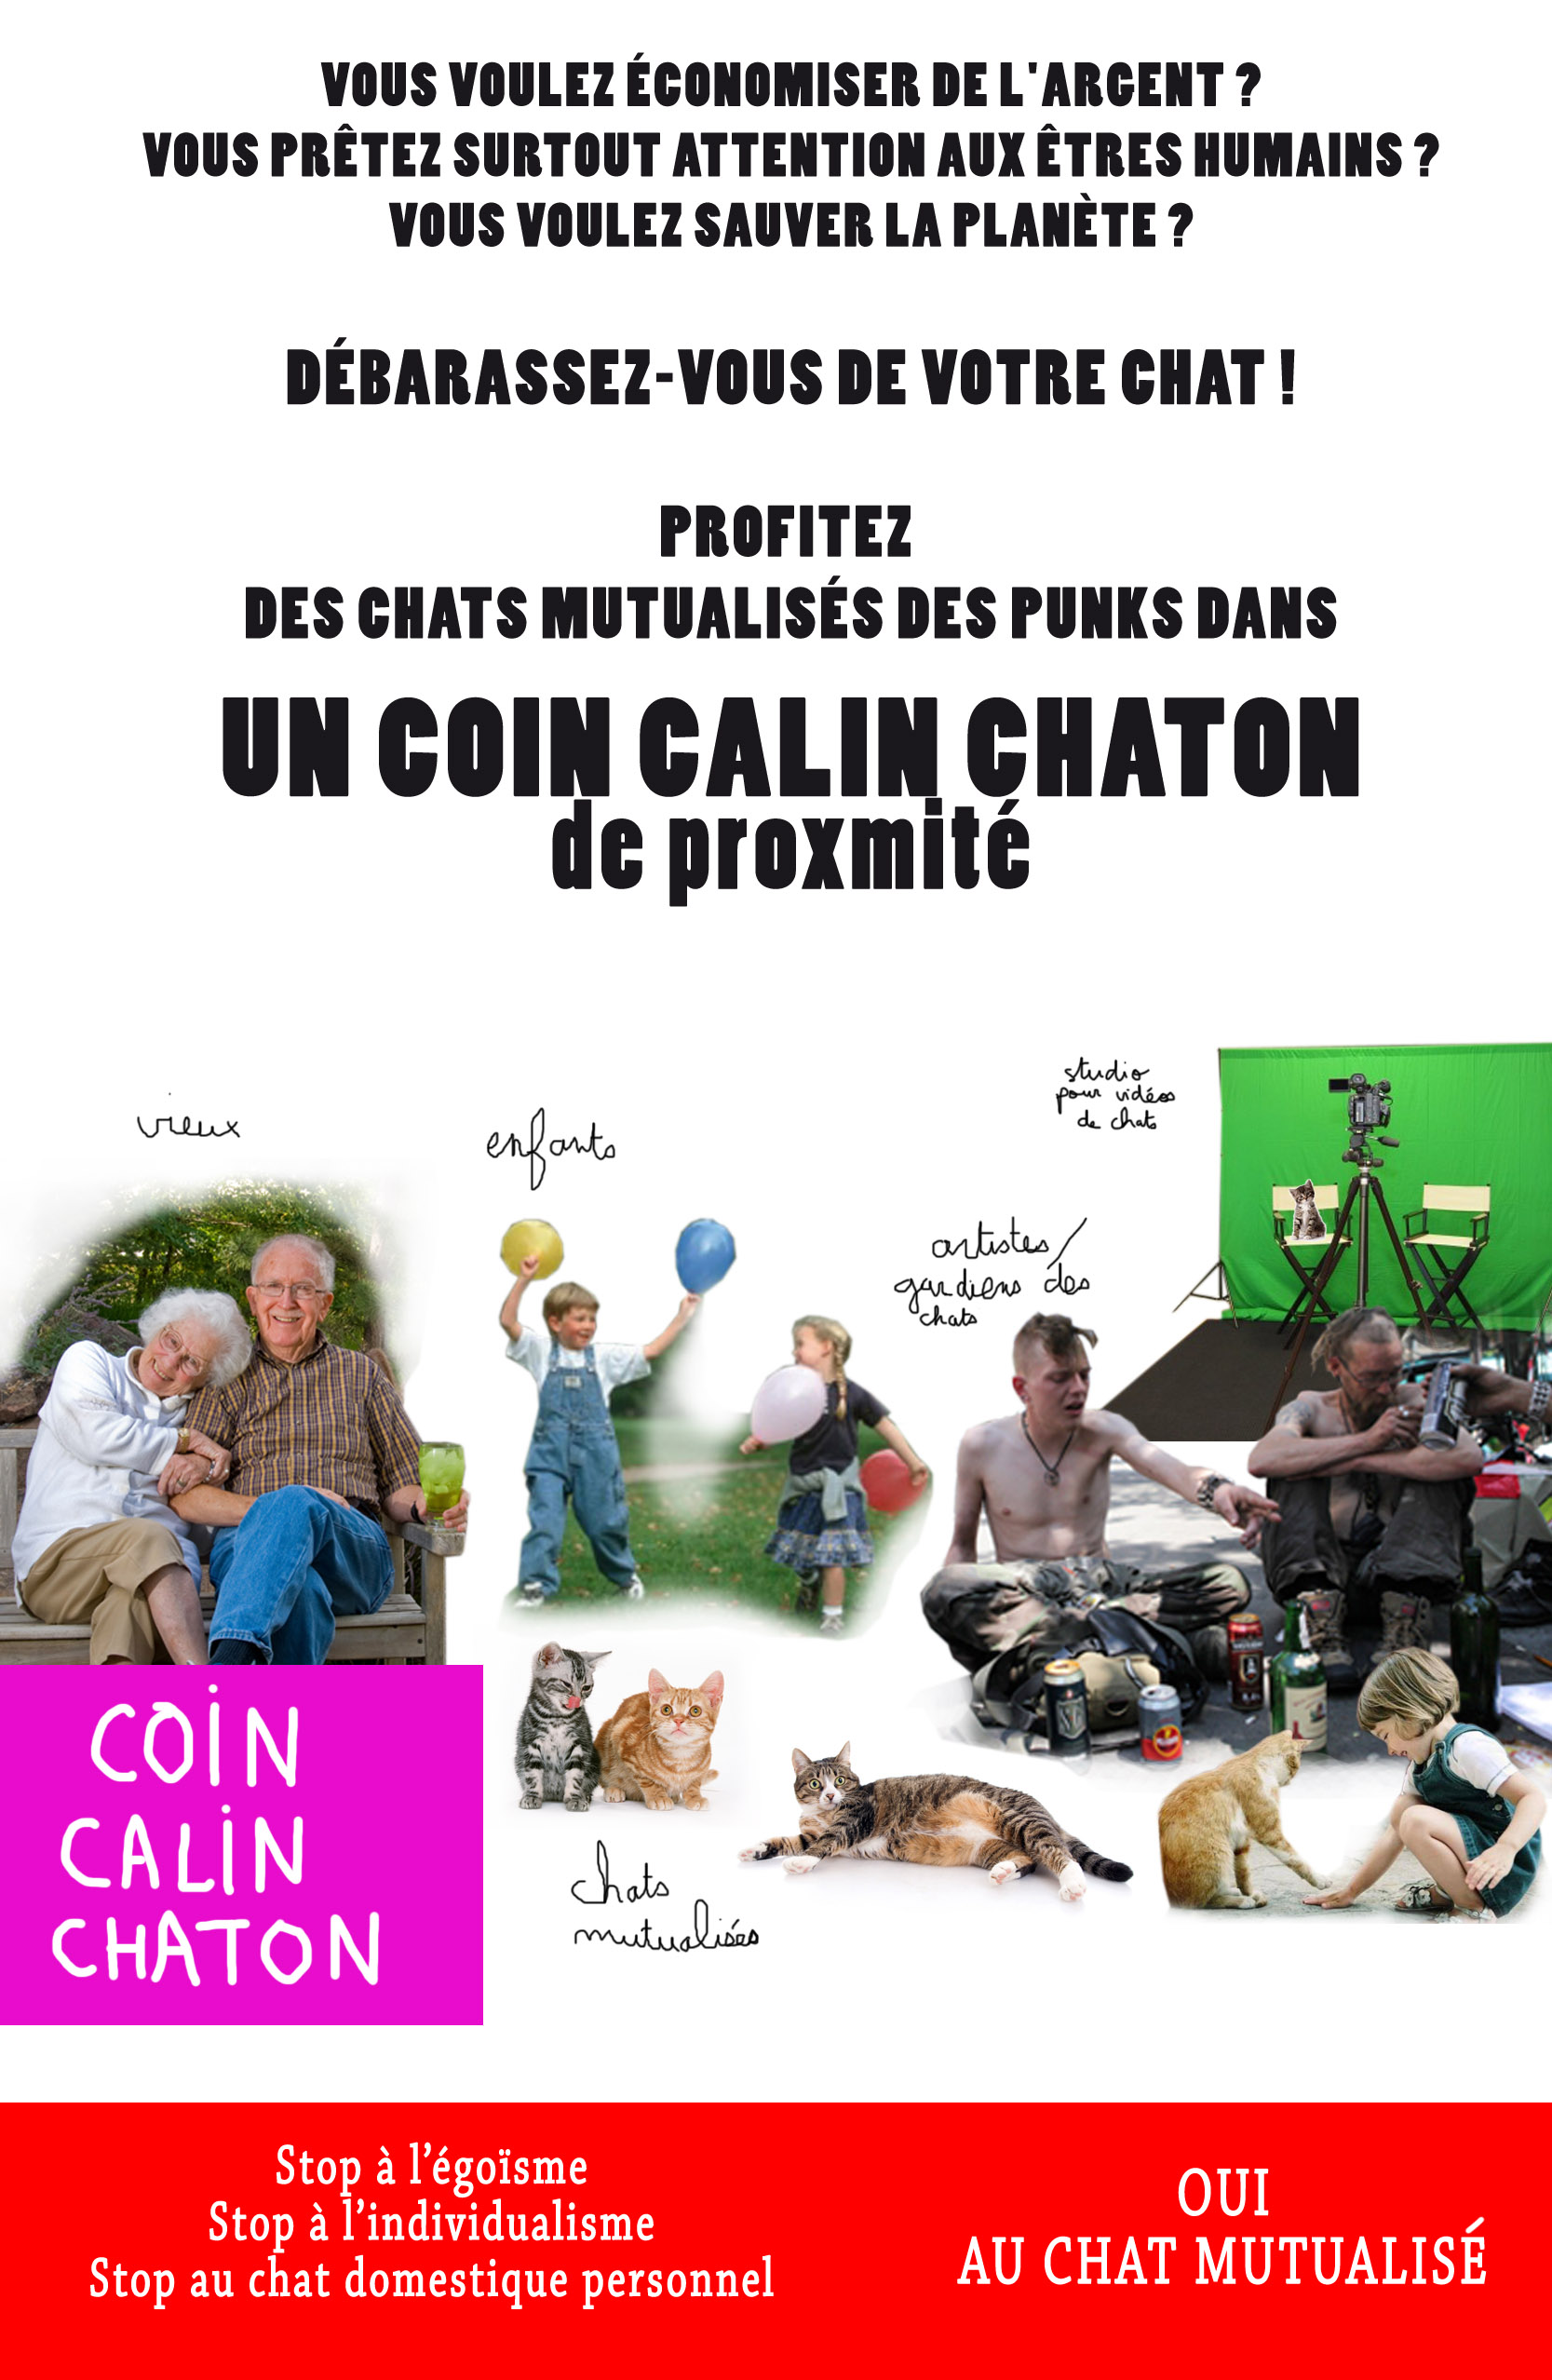 deuxdegres_economie_economie-circulaire_coin-calin-chaton